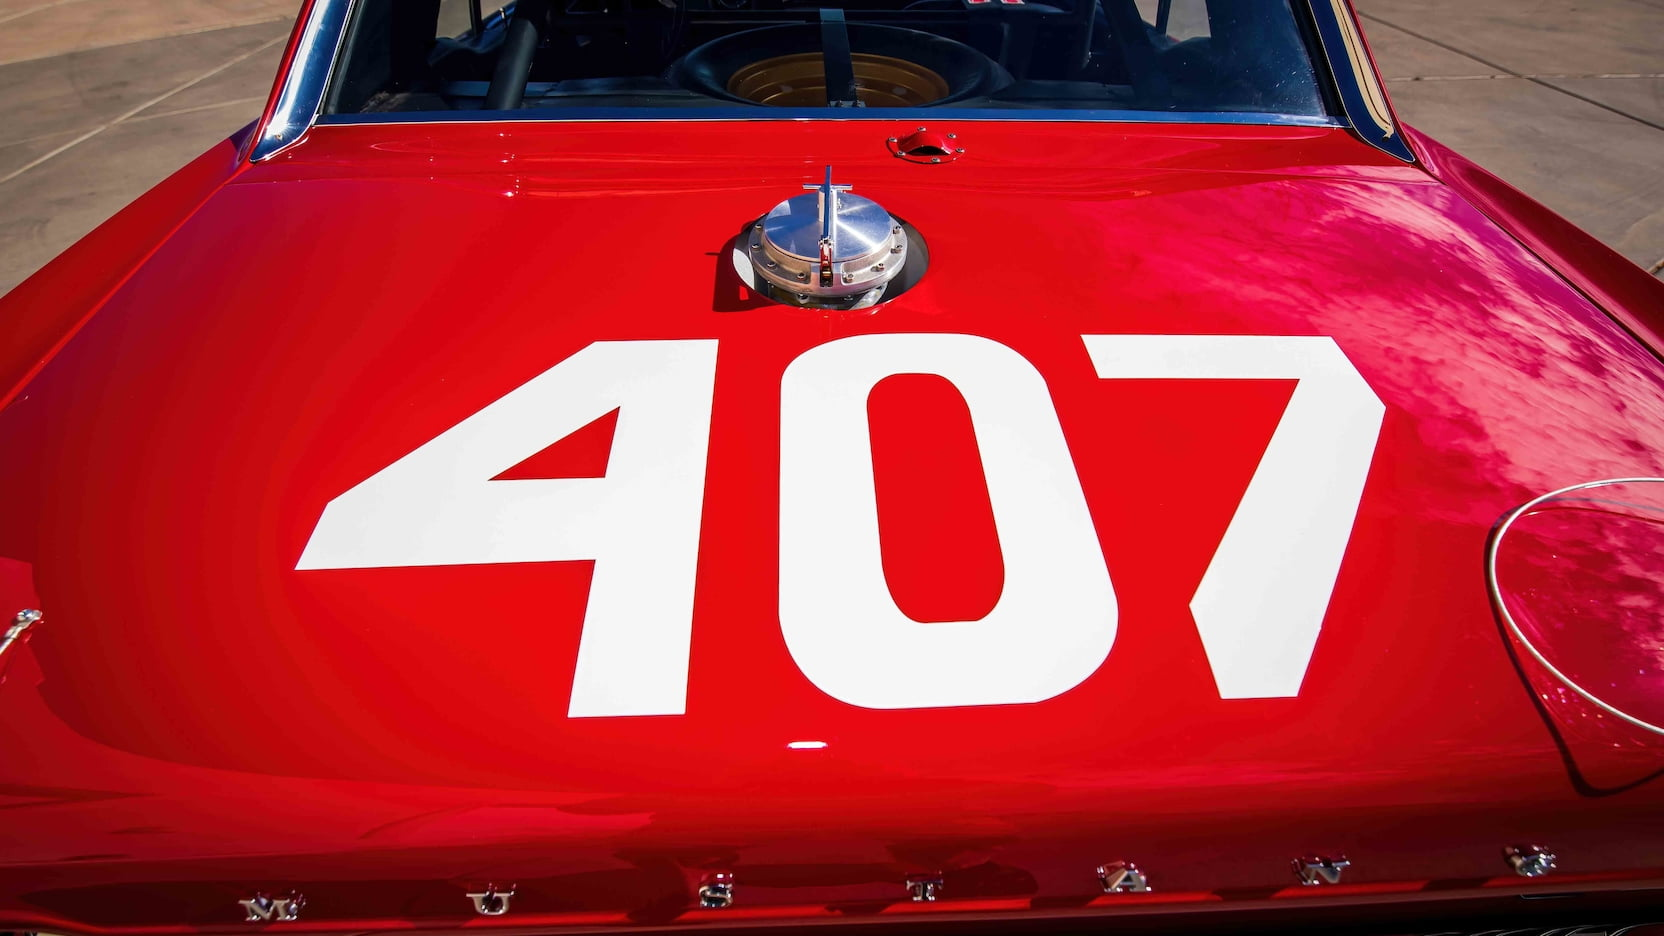 1967 Ford Mustang Holman-Moody rear 407